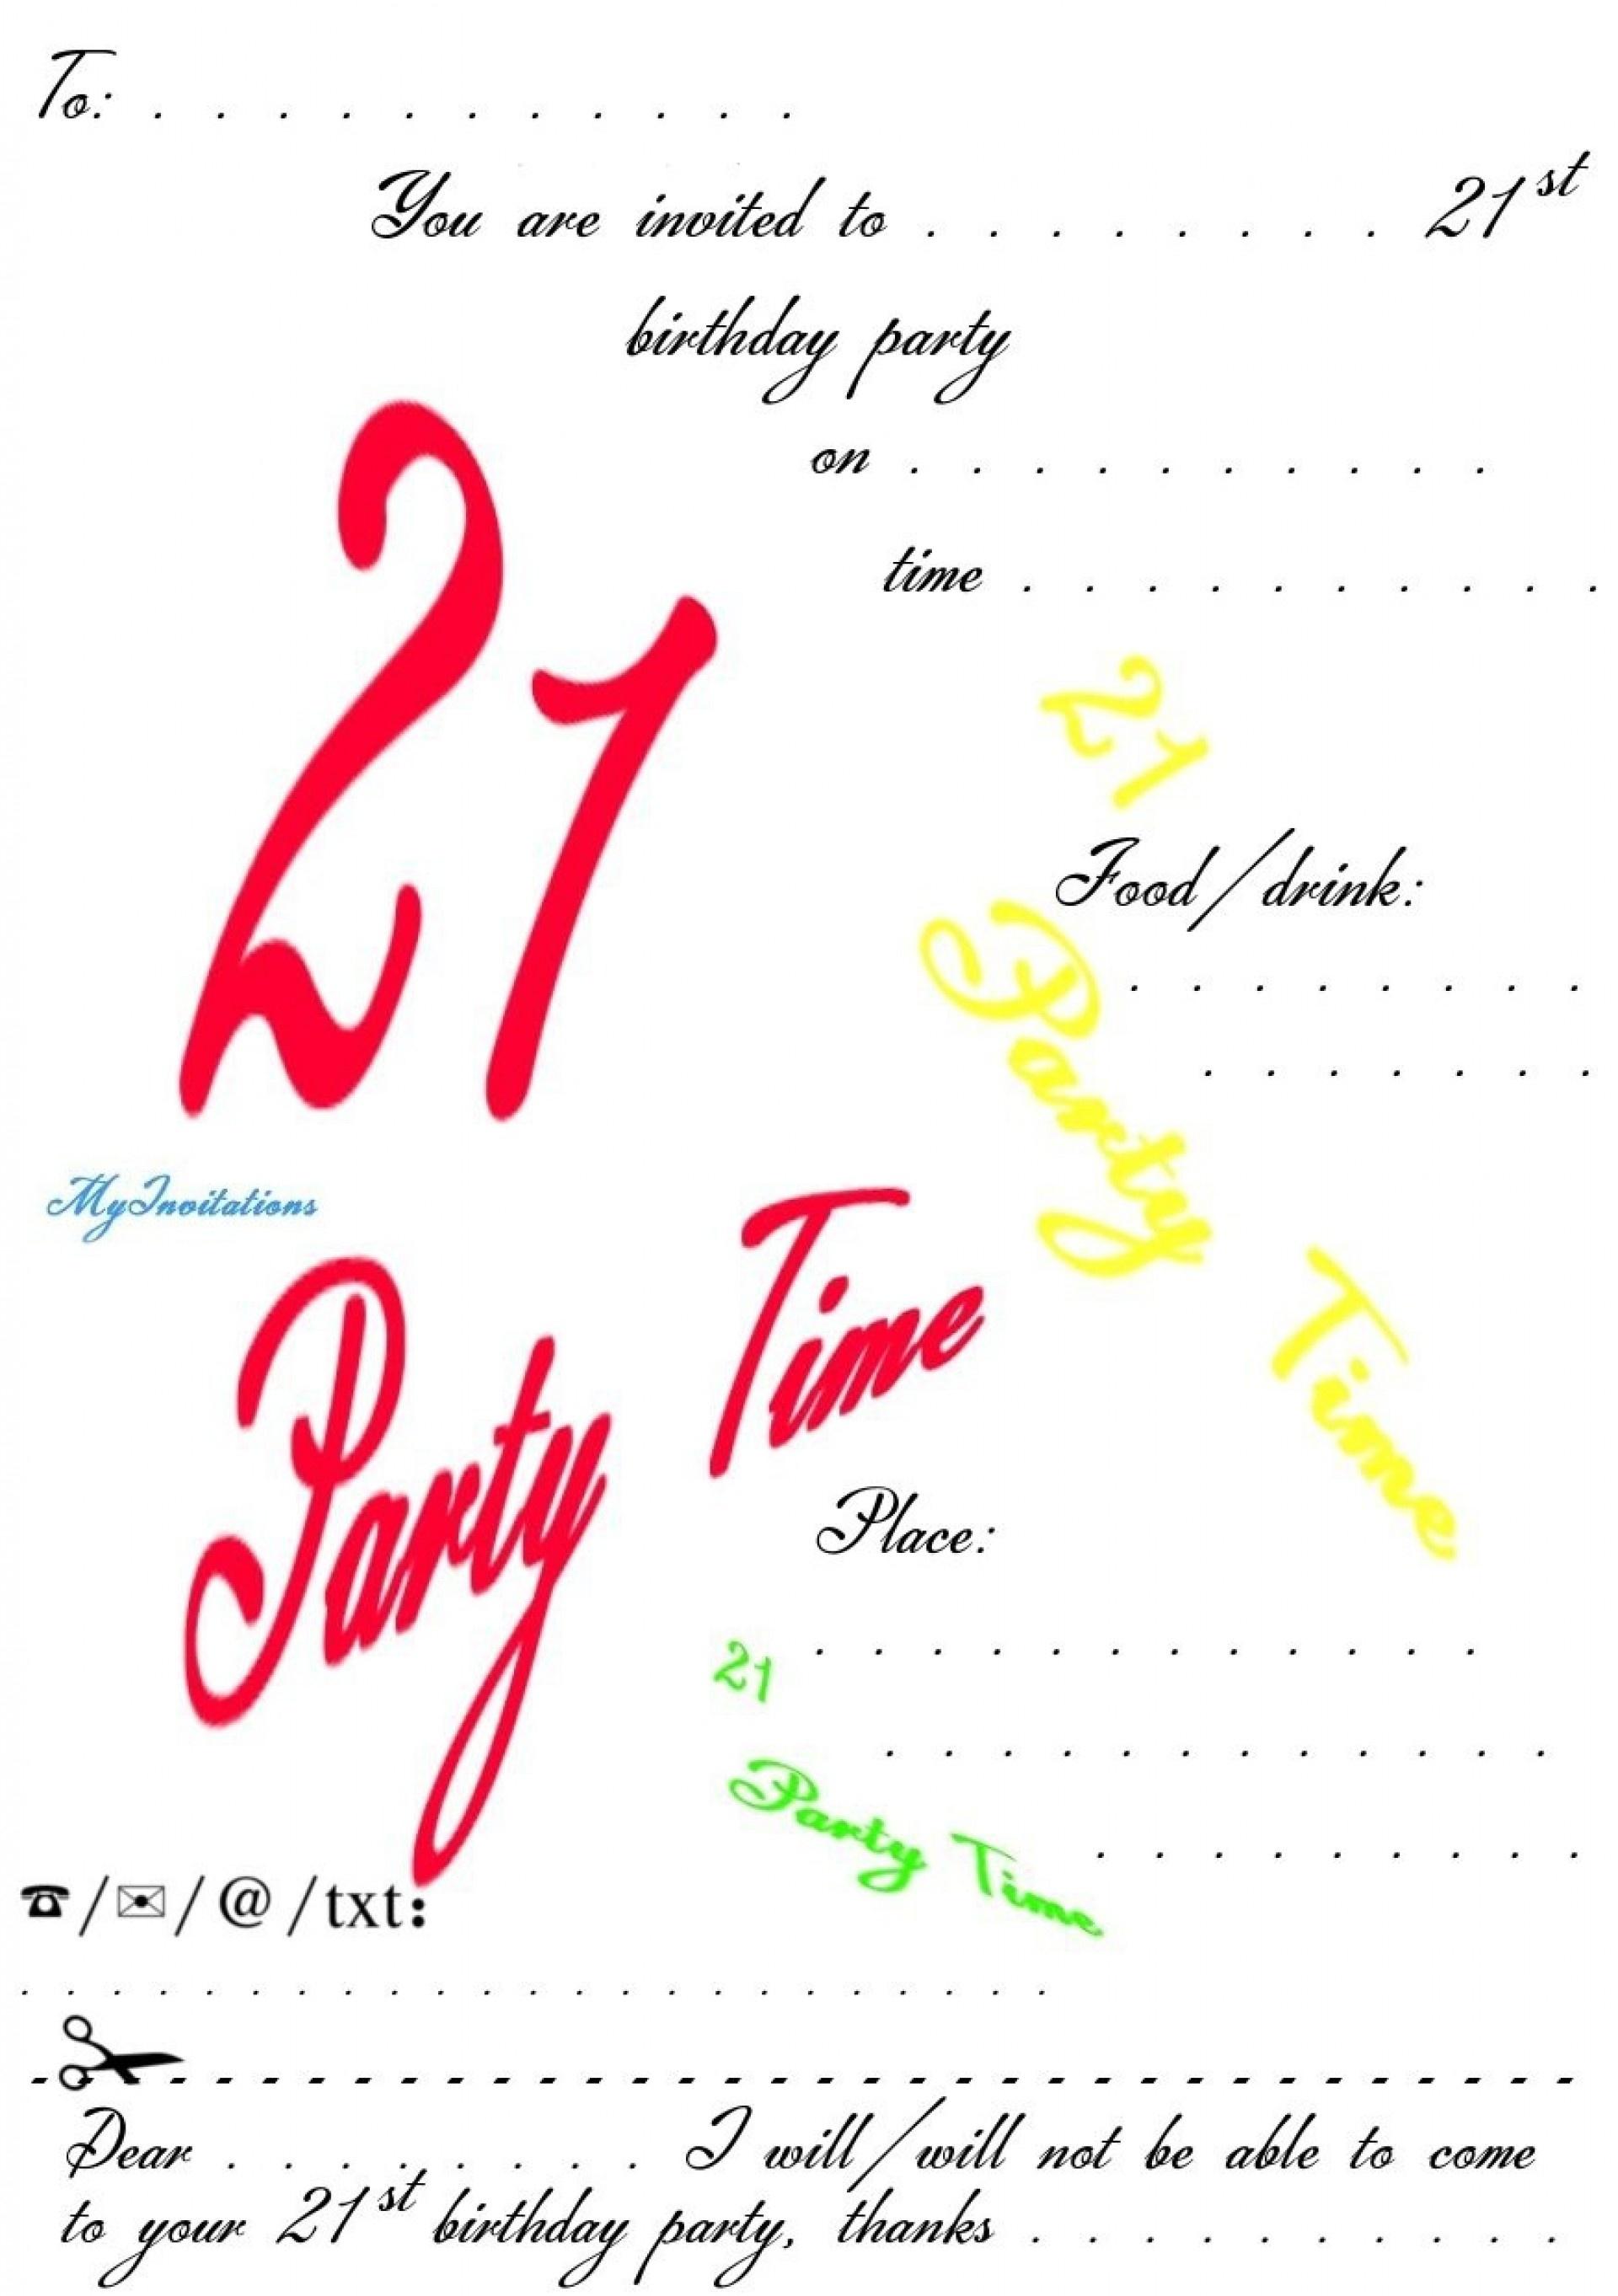 002 21St Birthday Invitation Templates Template Incredible Ideas - 21St Birthday Invitation Templates Free Printable